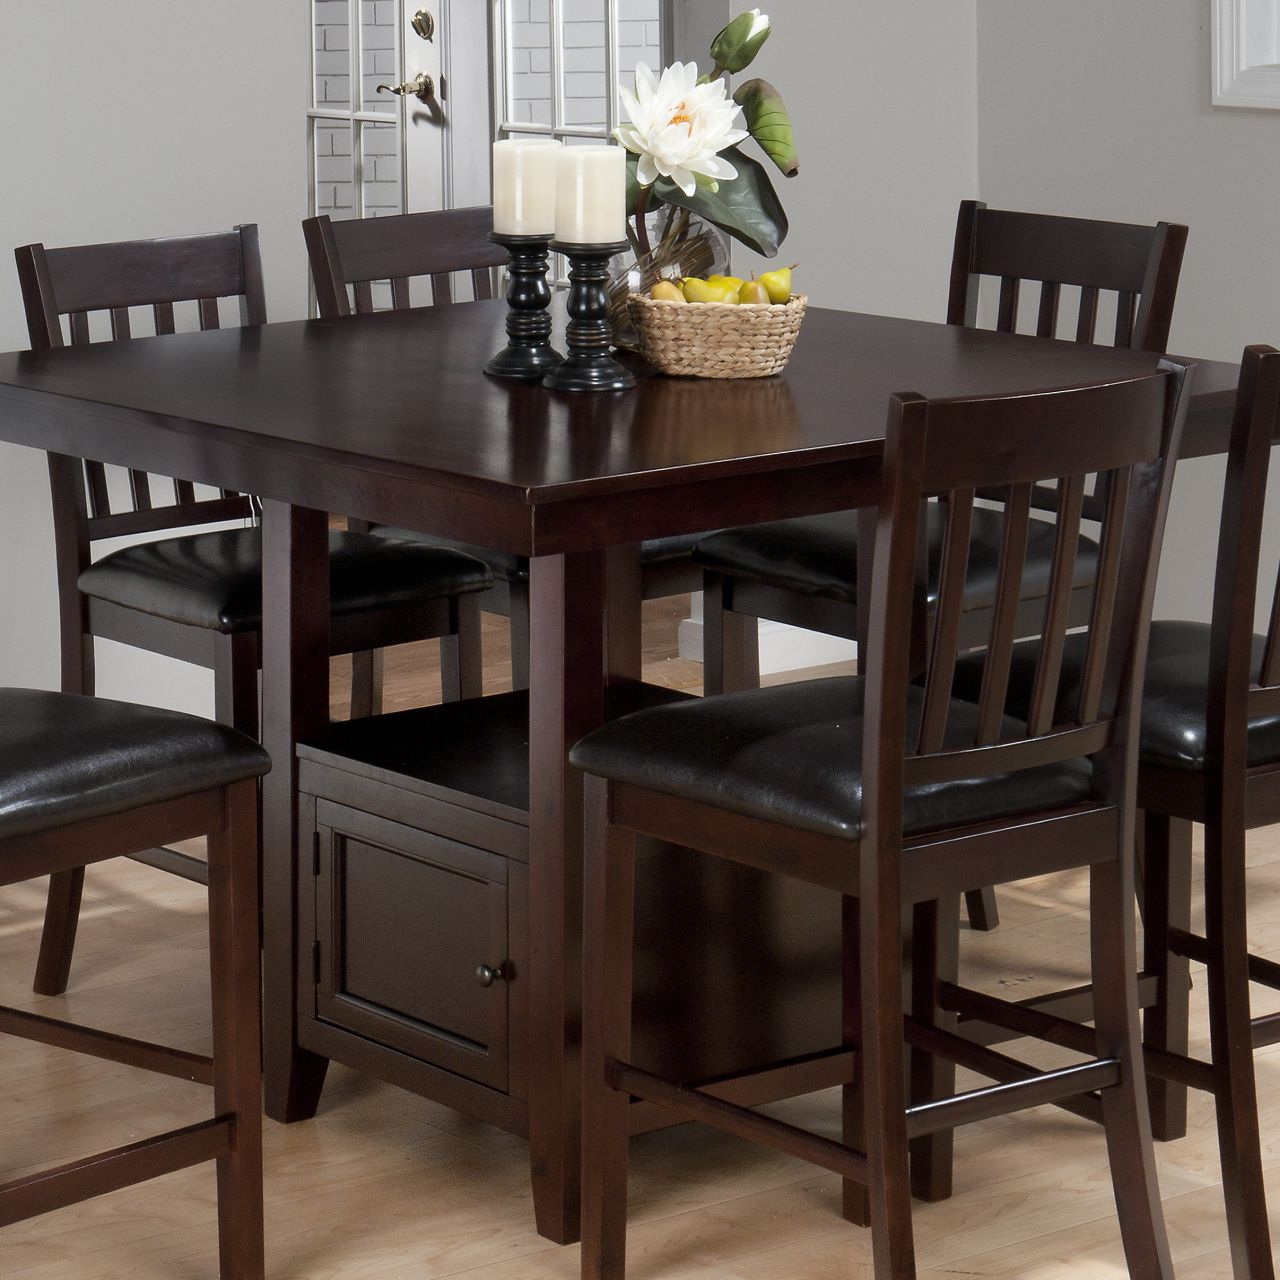 Wayfair kitchen table modern home office furniture check more at http www nikkitsfun com wayfair kitchen table